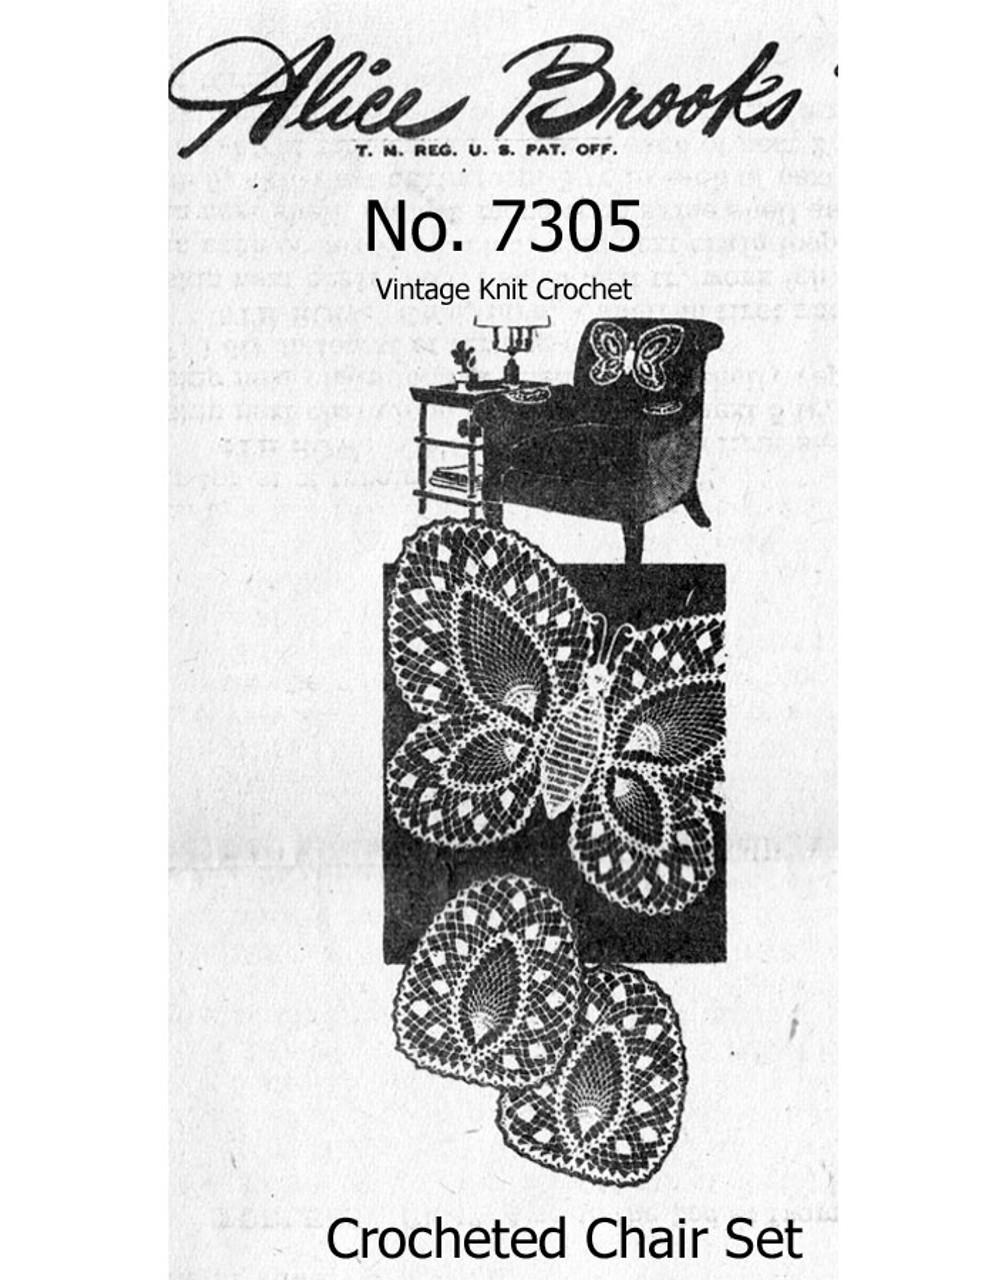 Vintage Butterfly Crochet Pattern, Lace Chair Set Design 7305